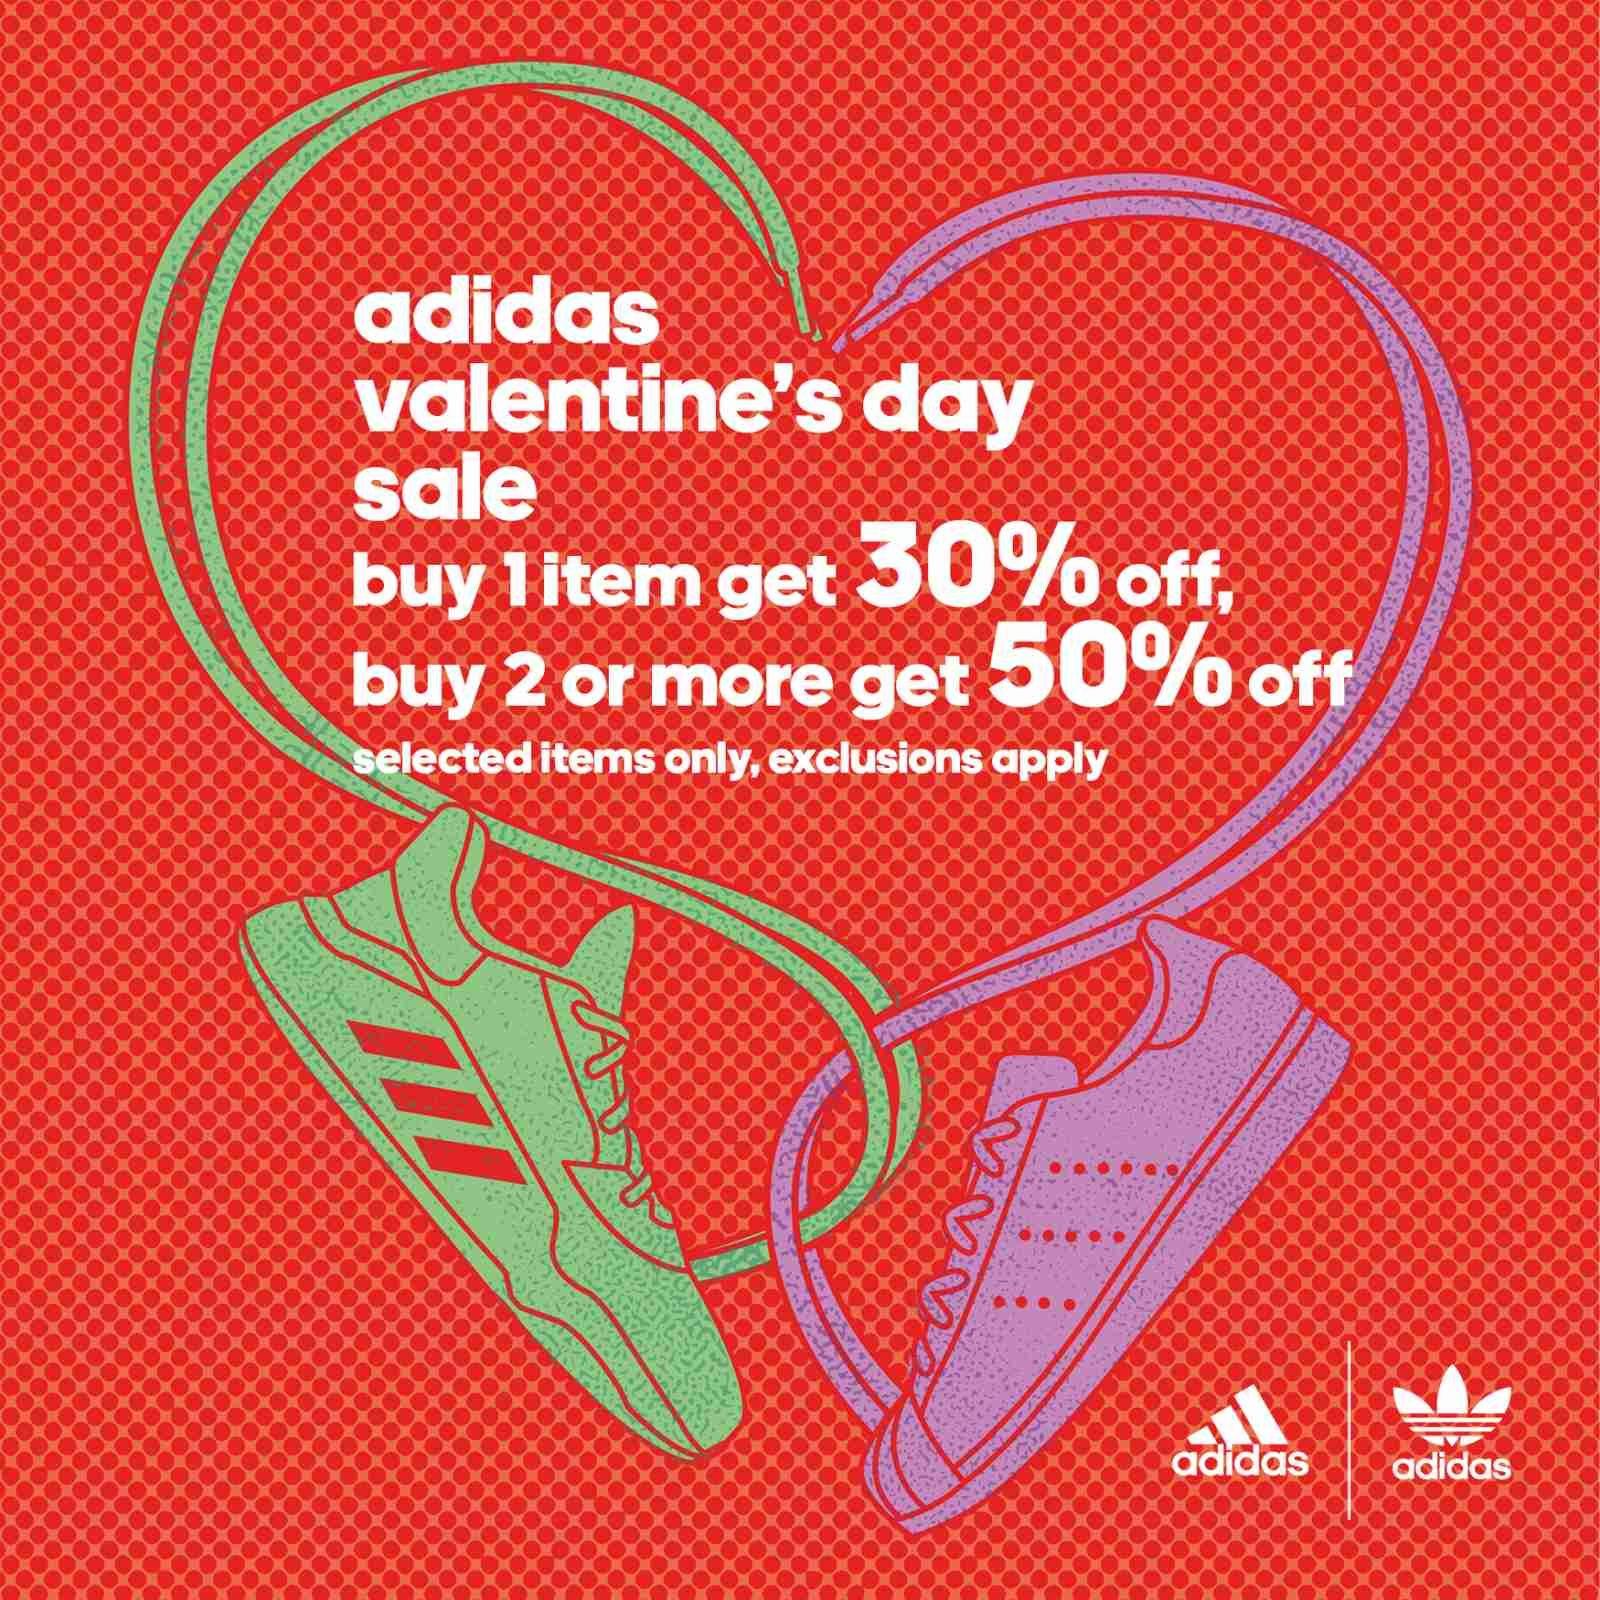 Adidas Valentine's Day Sale Poster